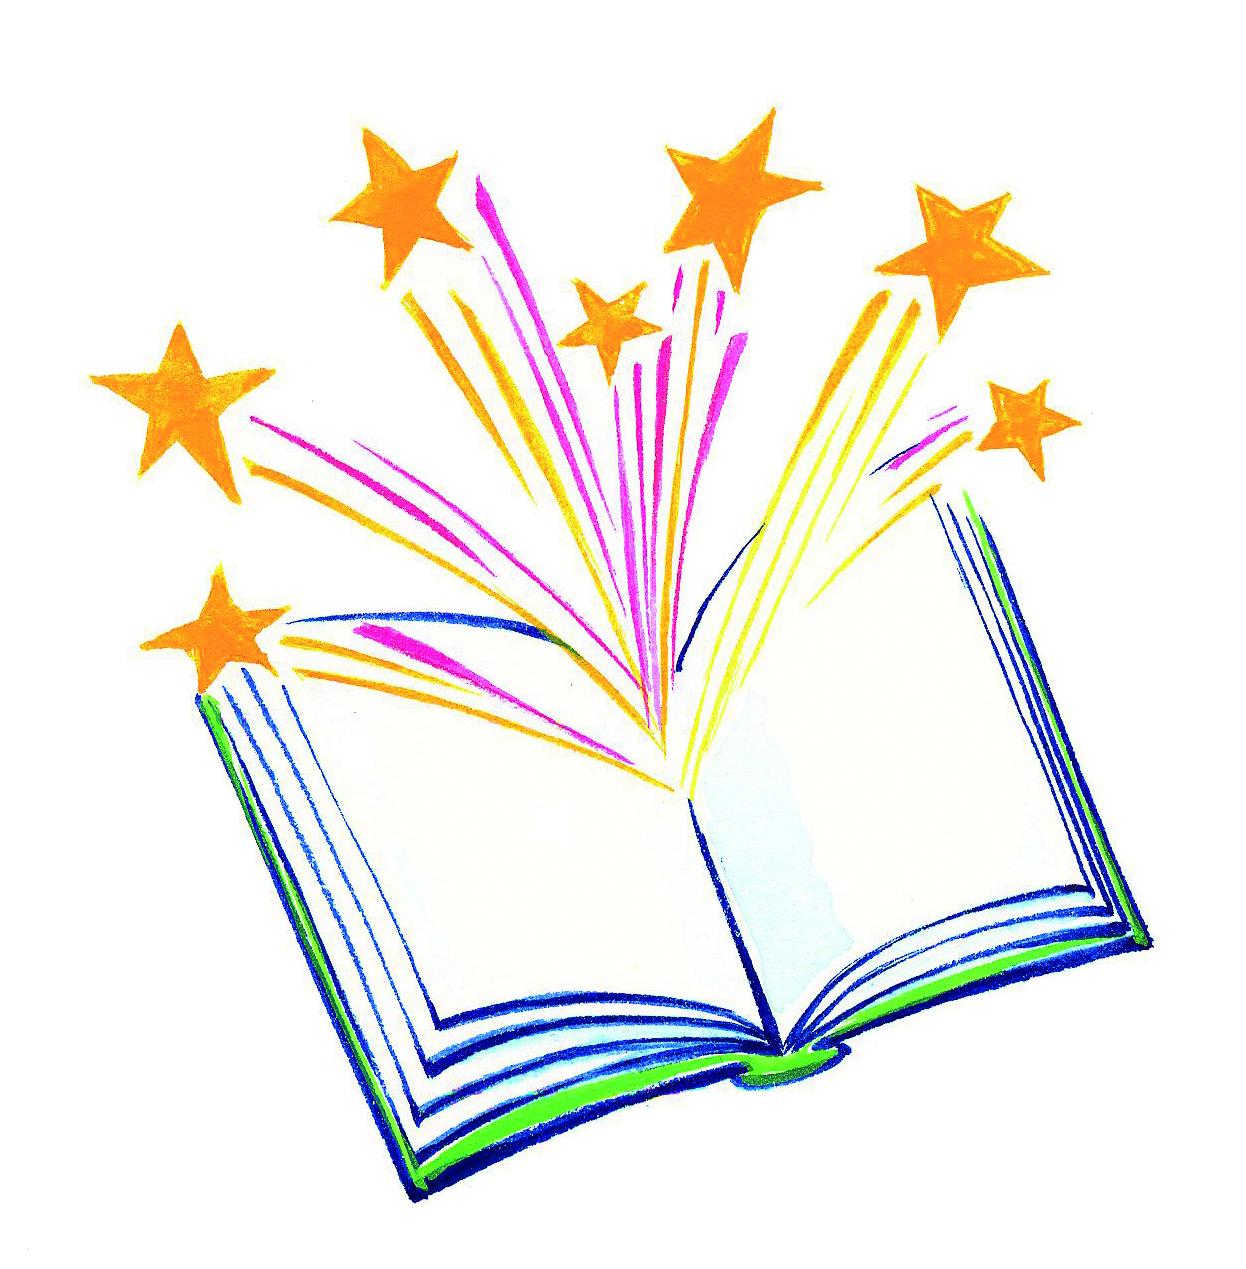 selena kitt libros en español pdf